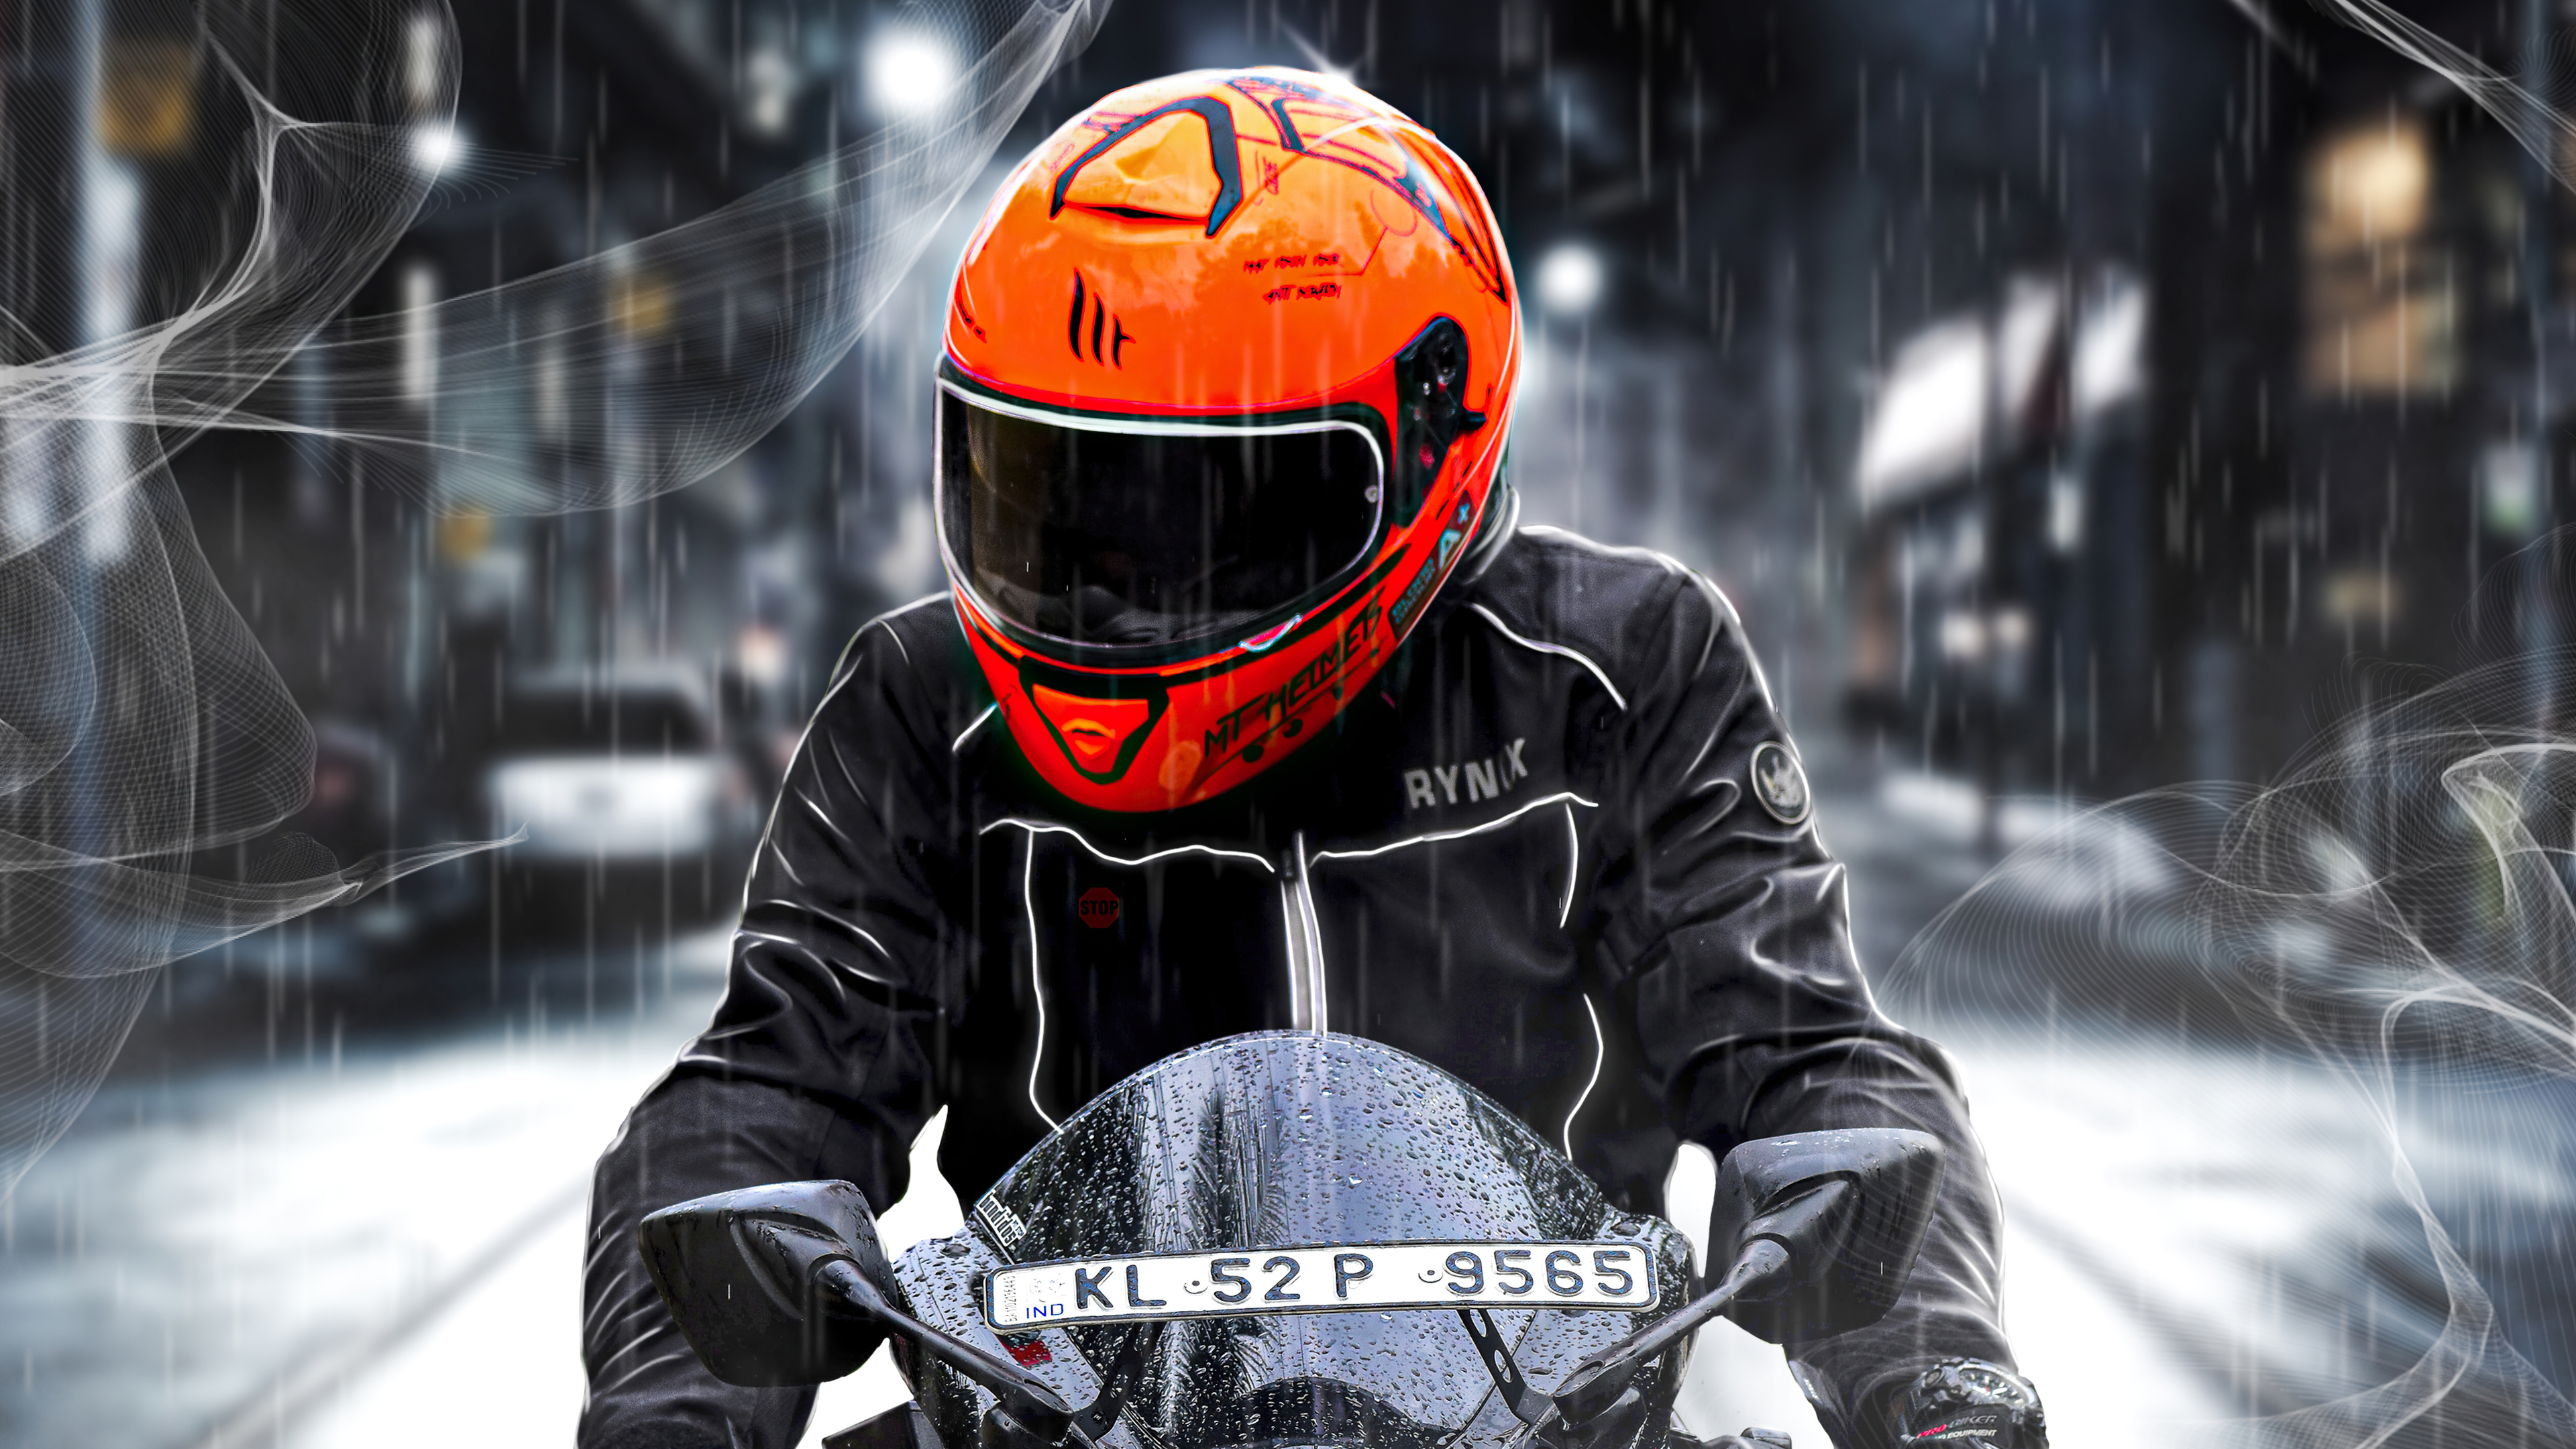 orange helmet biker 4k 1609016167 - Orange Helmet Biker 4k - Orange Helmet Biker 4k wallpapers